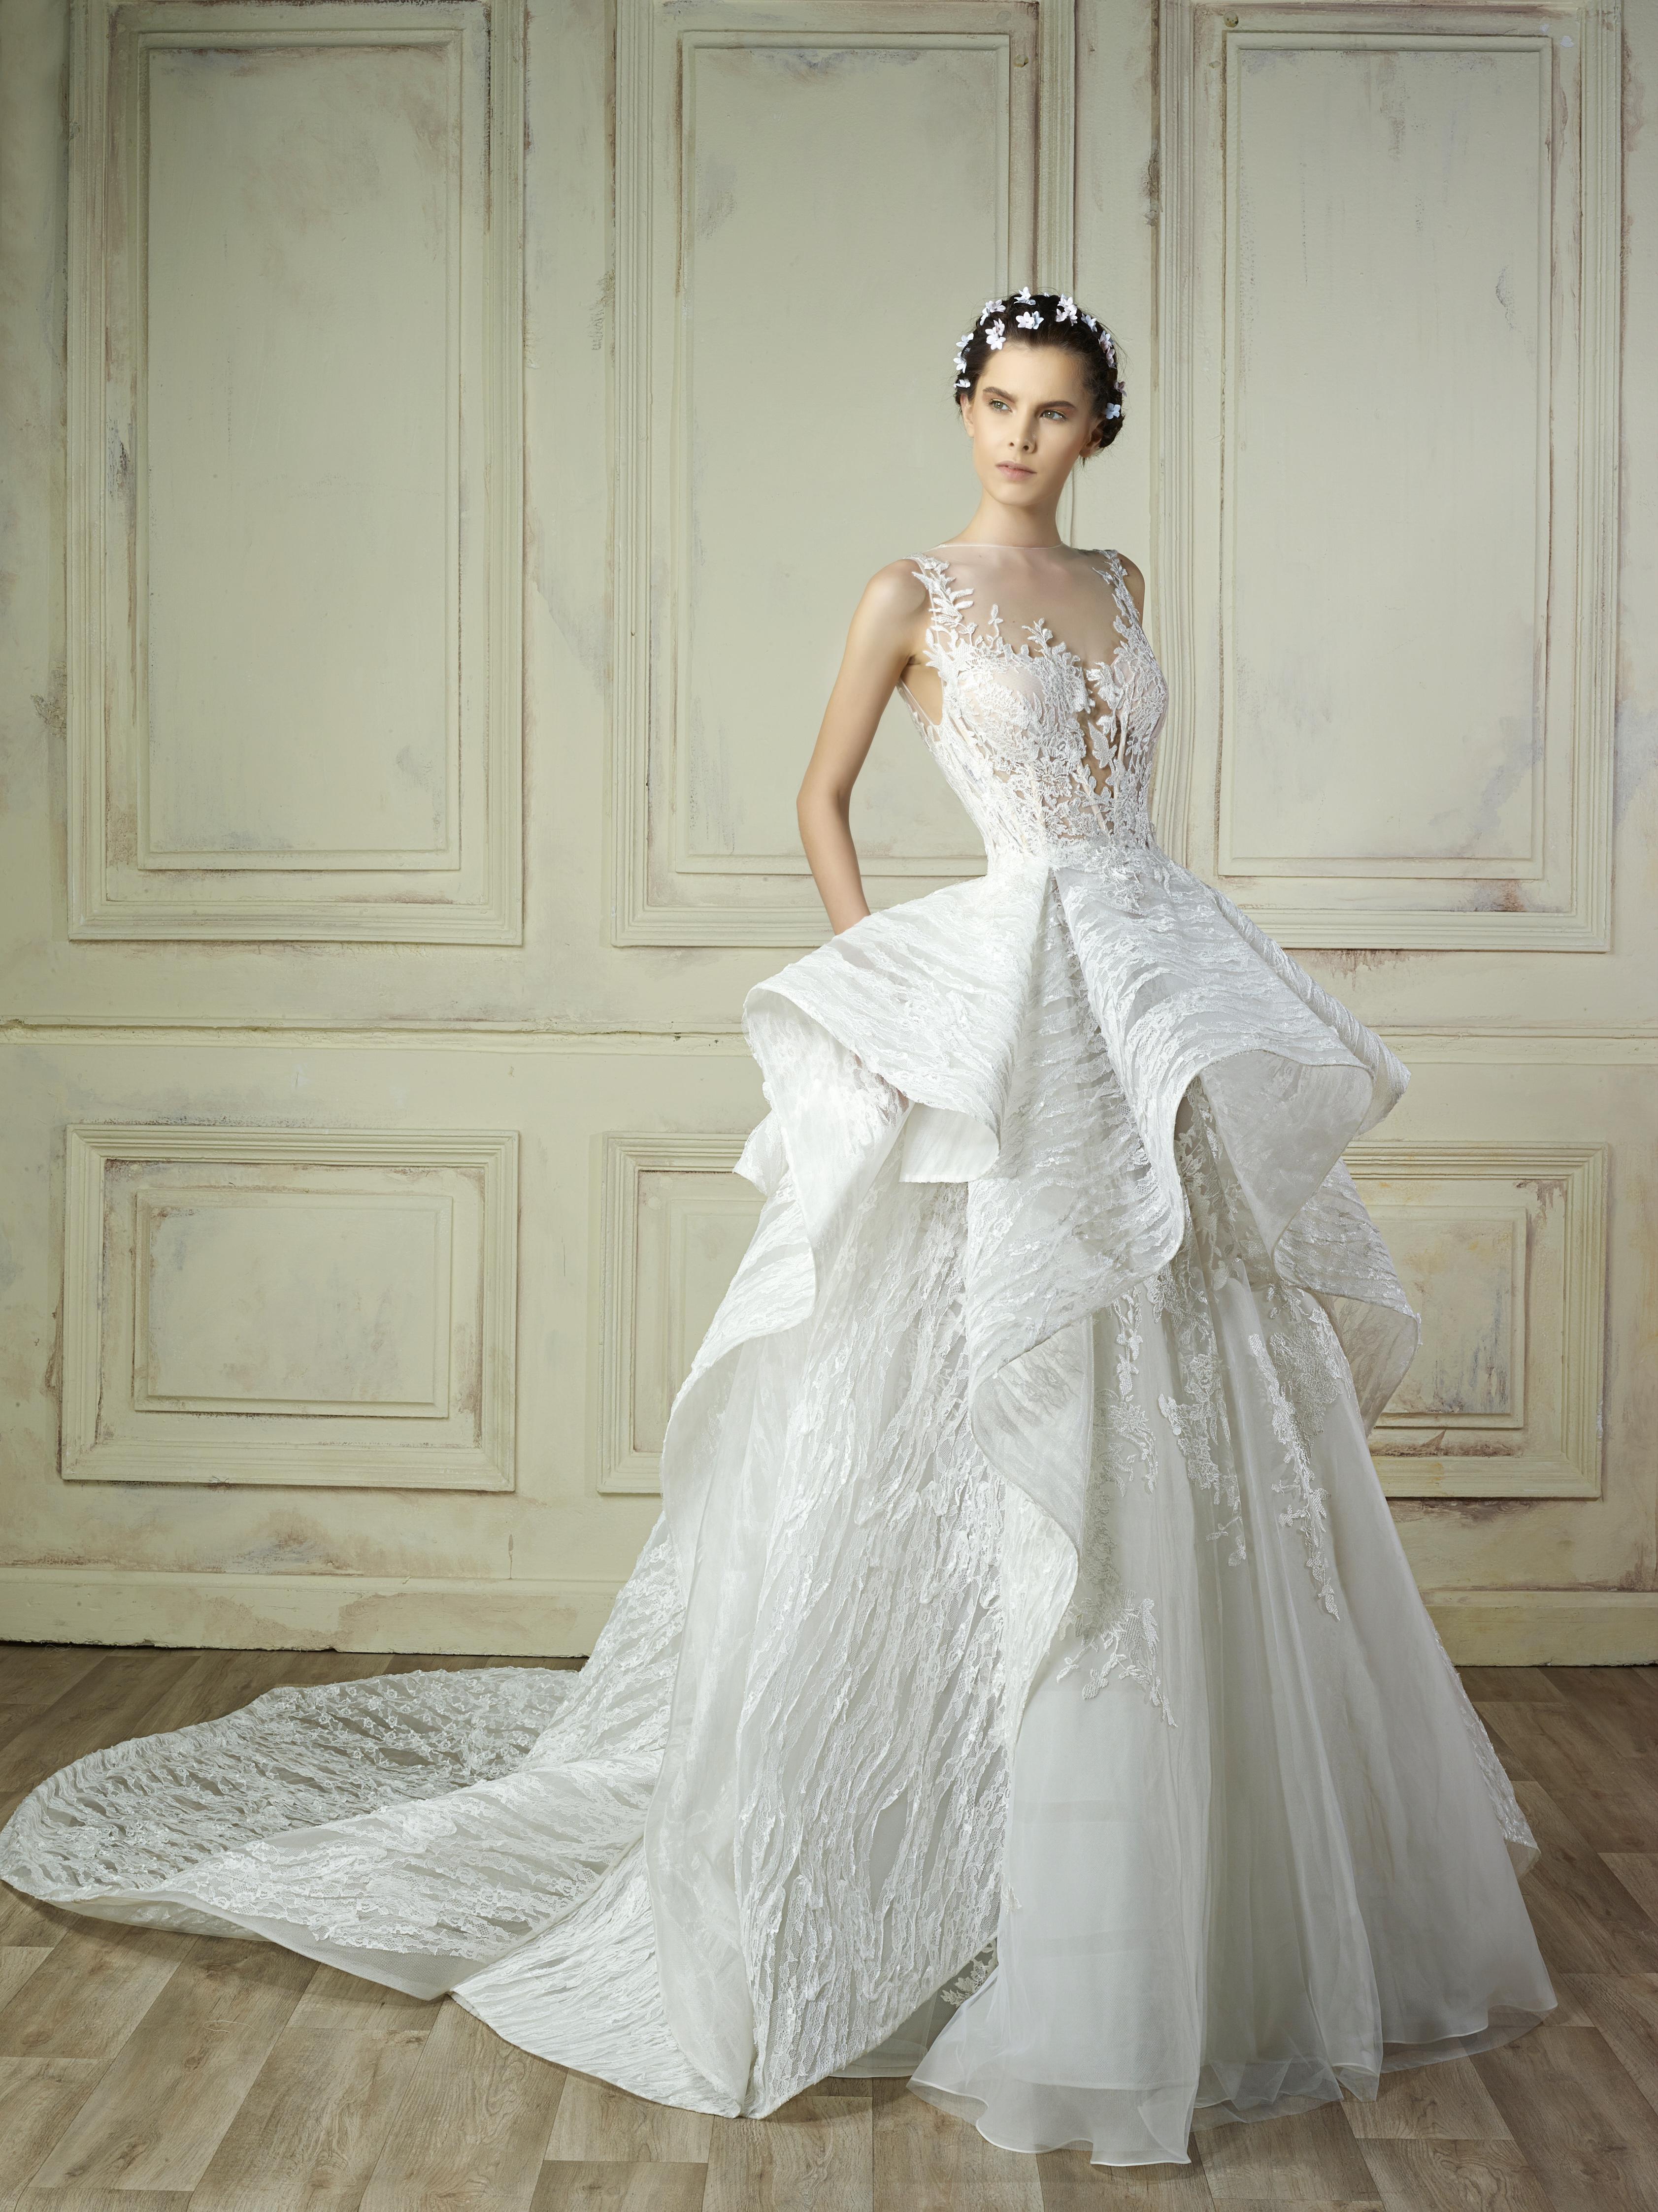 illusion ball gown gemy maalouf wedding dress spring2018